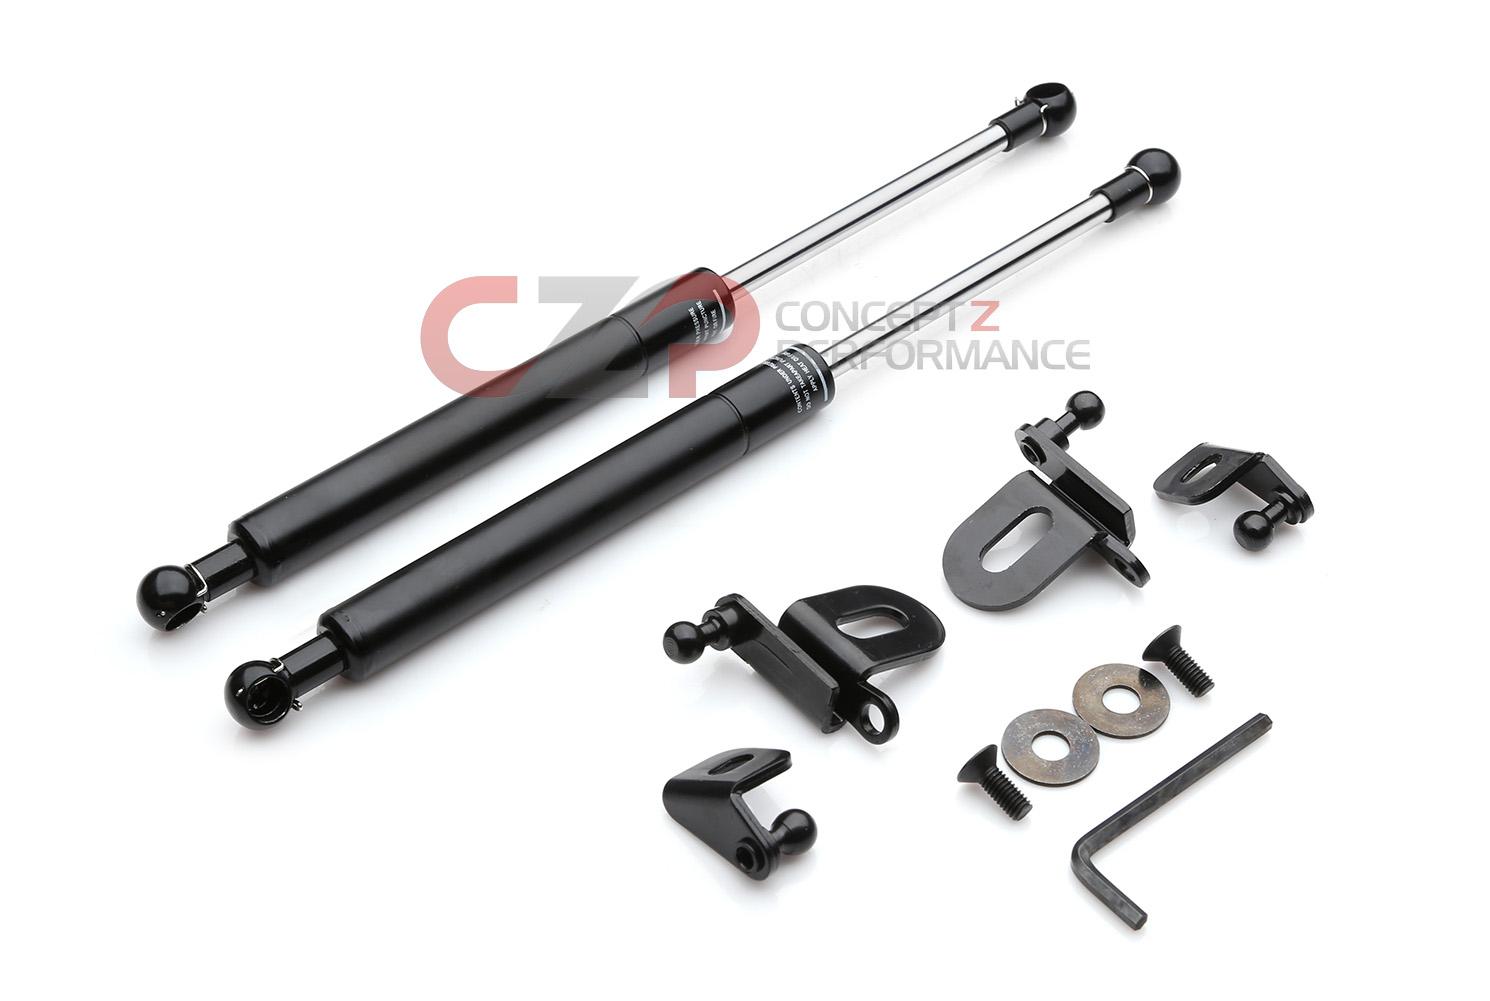 Circuit Sports Ehd Ig35 Tp Hood Damper Strut Kit Non Carbon Series